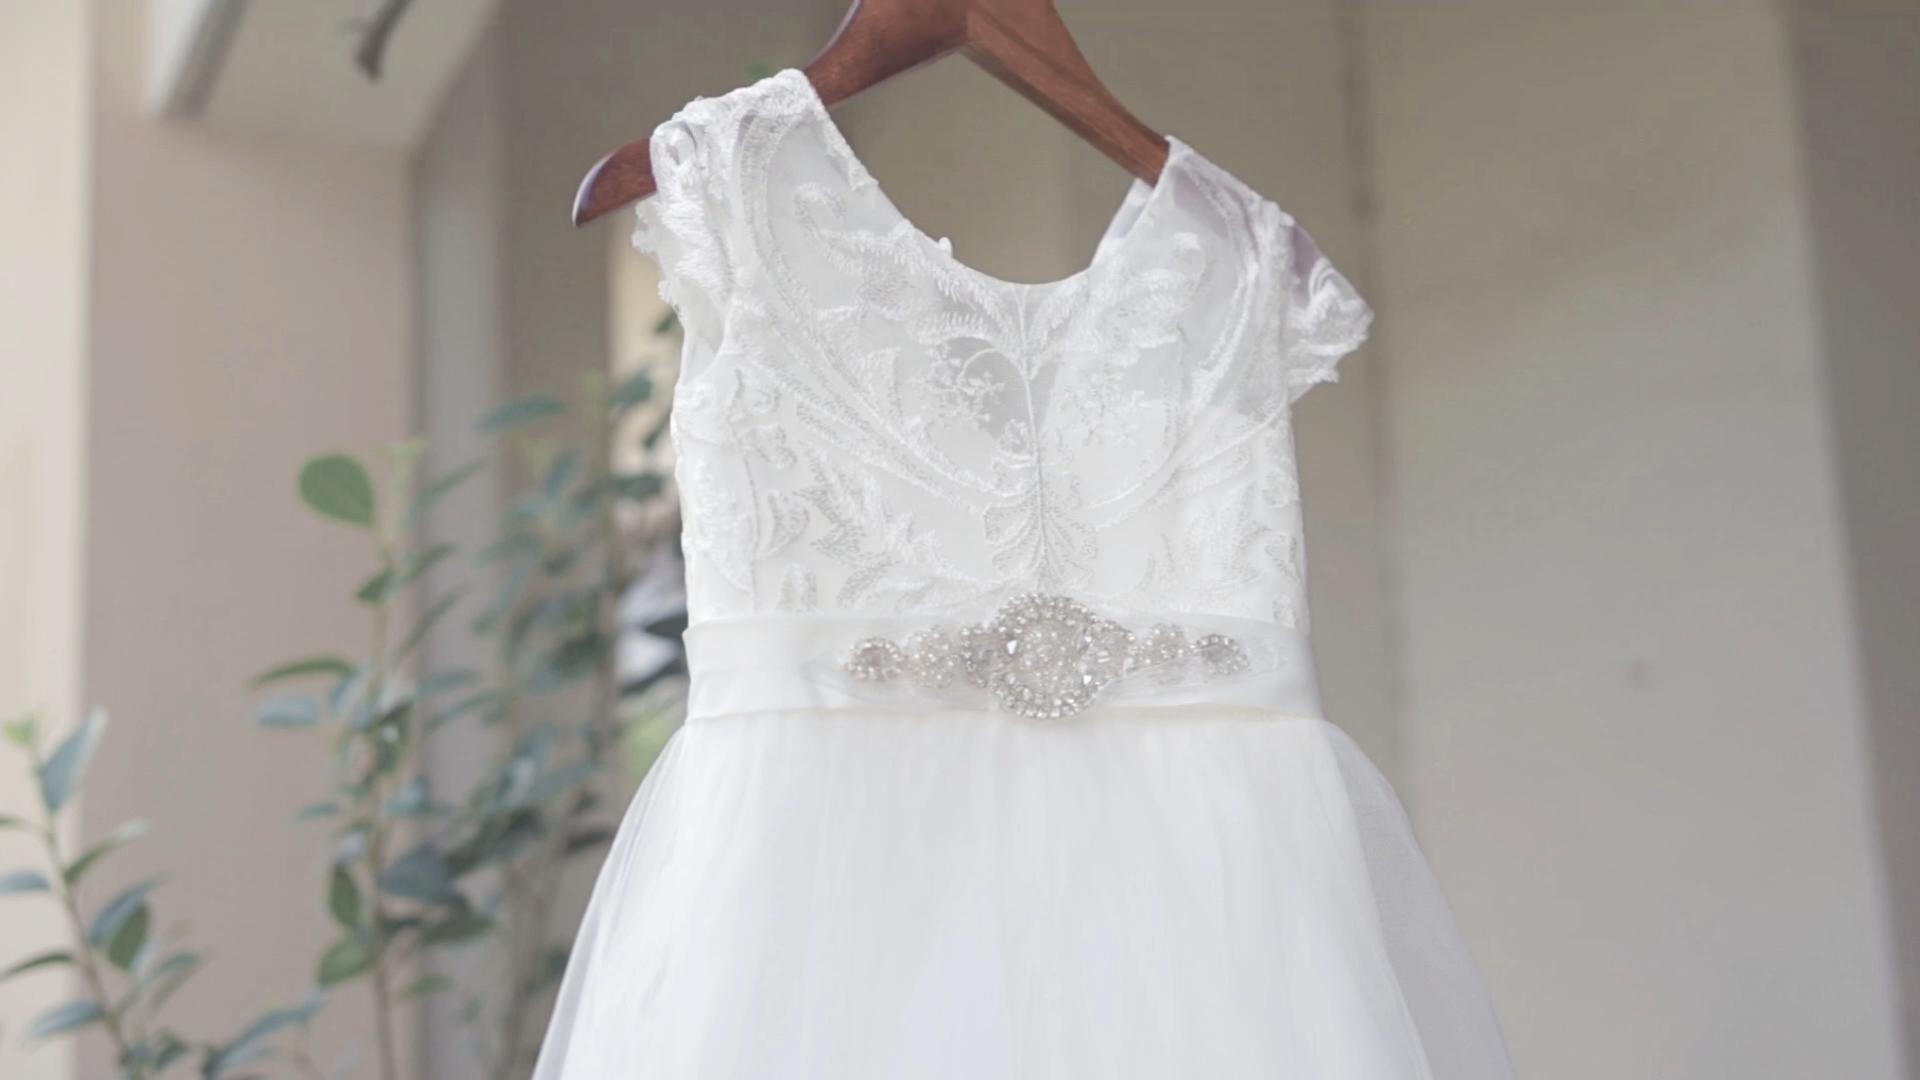 Boutique Wholesale Kids Girls Metallic Lace Cap Sleeve Ball Gown Children Little Girl Princess Wedding Long Party Dress